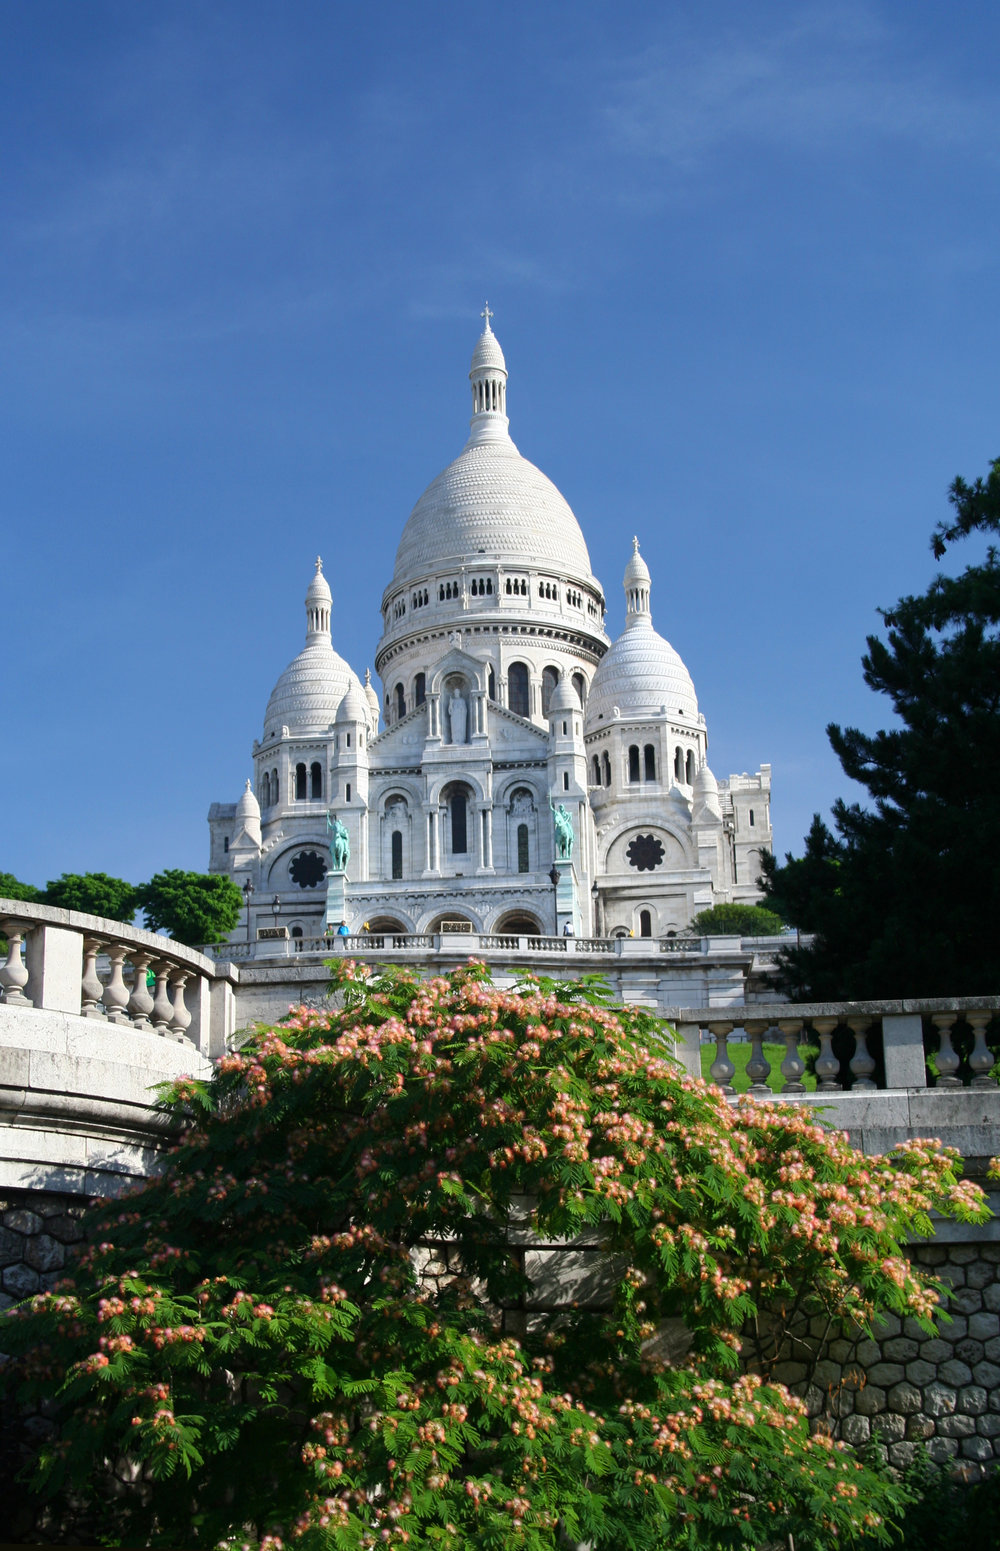 F_Paris_Sacre-Coeur_Basilica-2.jpg